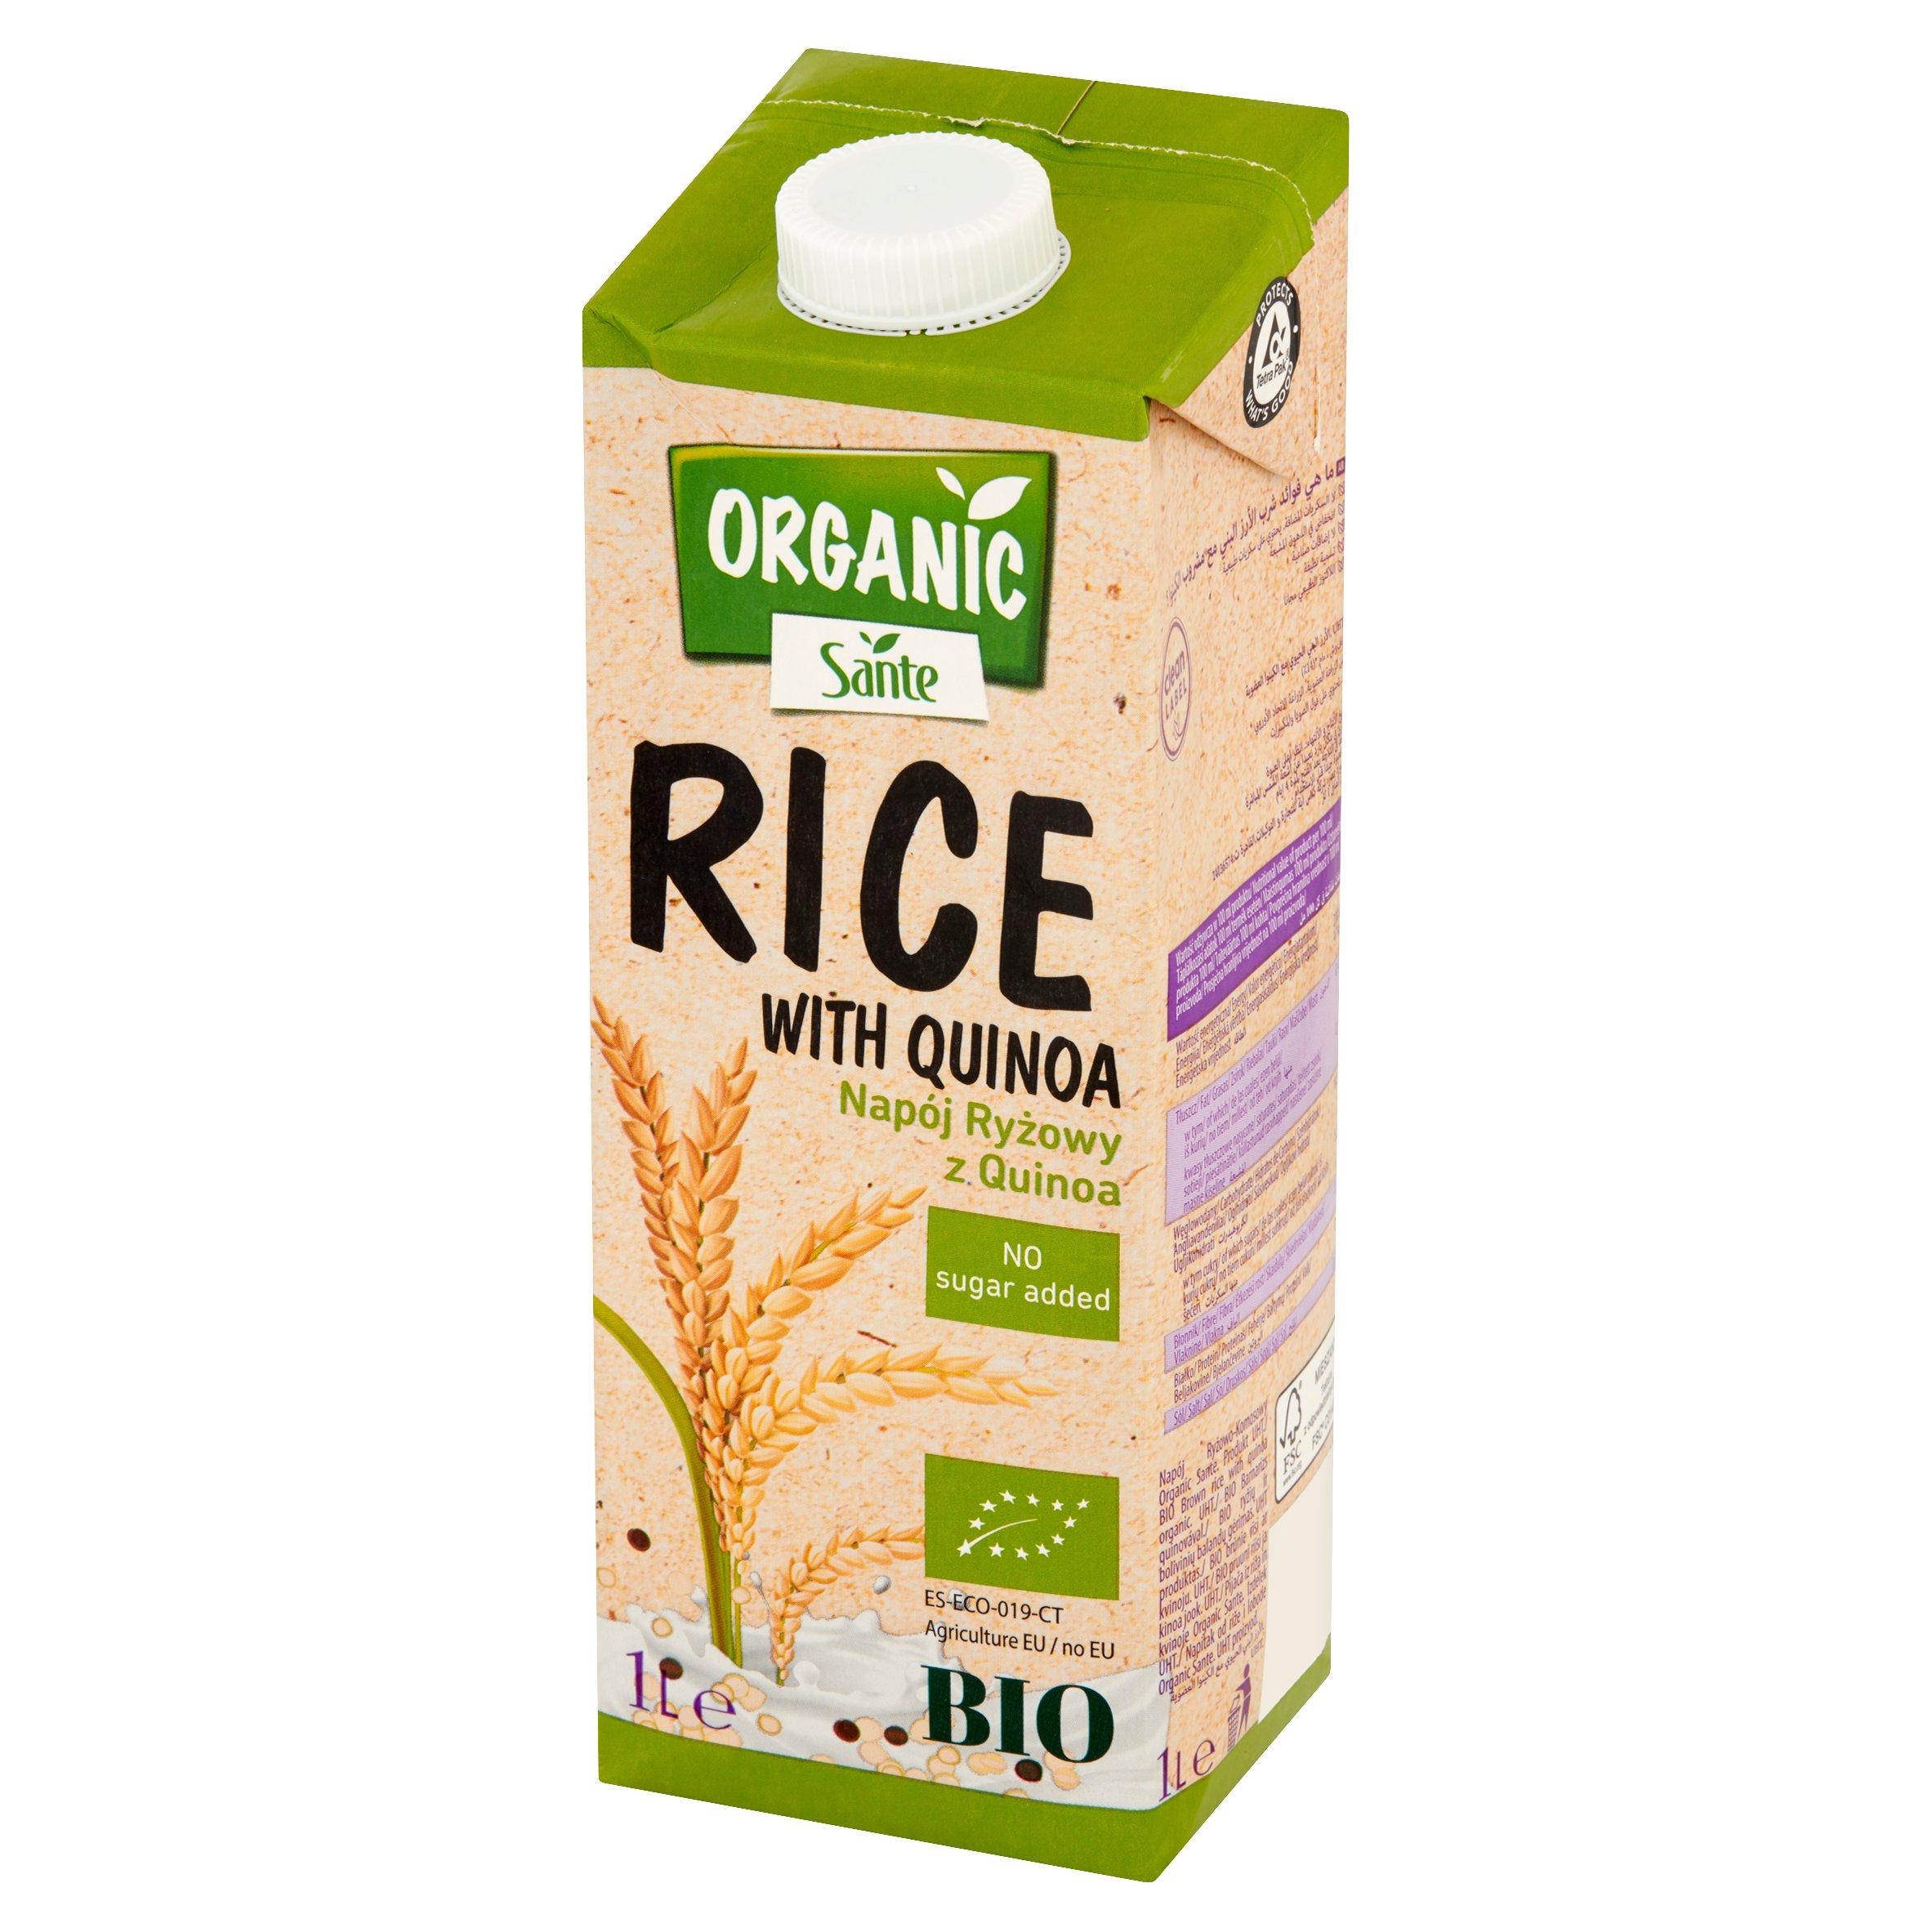 Sante Organic Napój ryżowy z quinoa 1l (3)